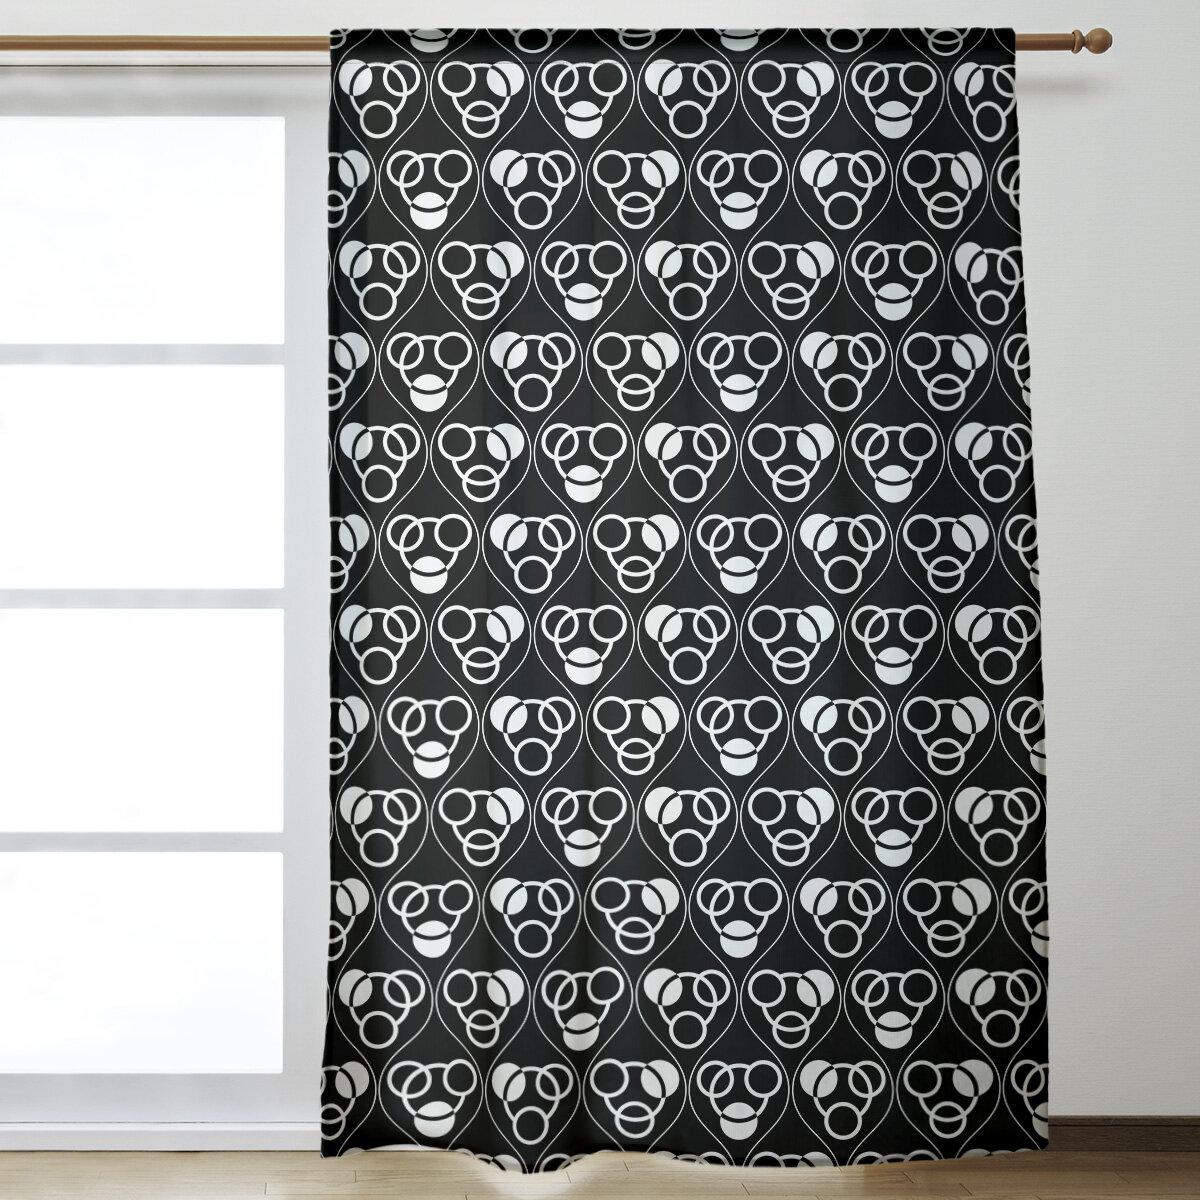 Brayden Studio Classic Circles And Waves Geometric Room Darkening Thermal Rod Pocket Single Curtain Panel Wayfair